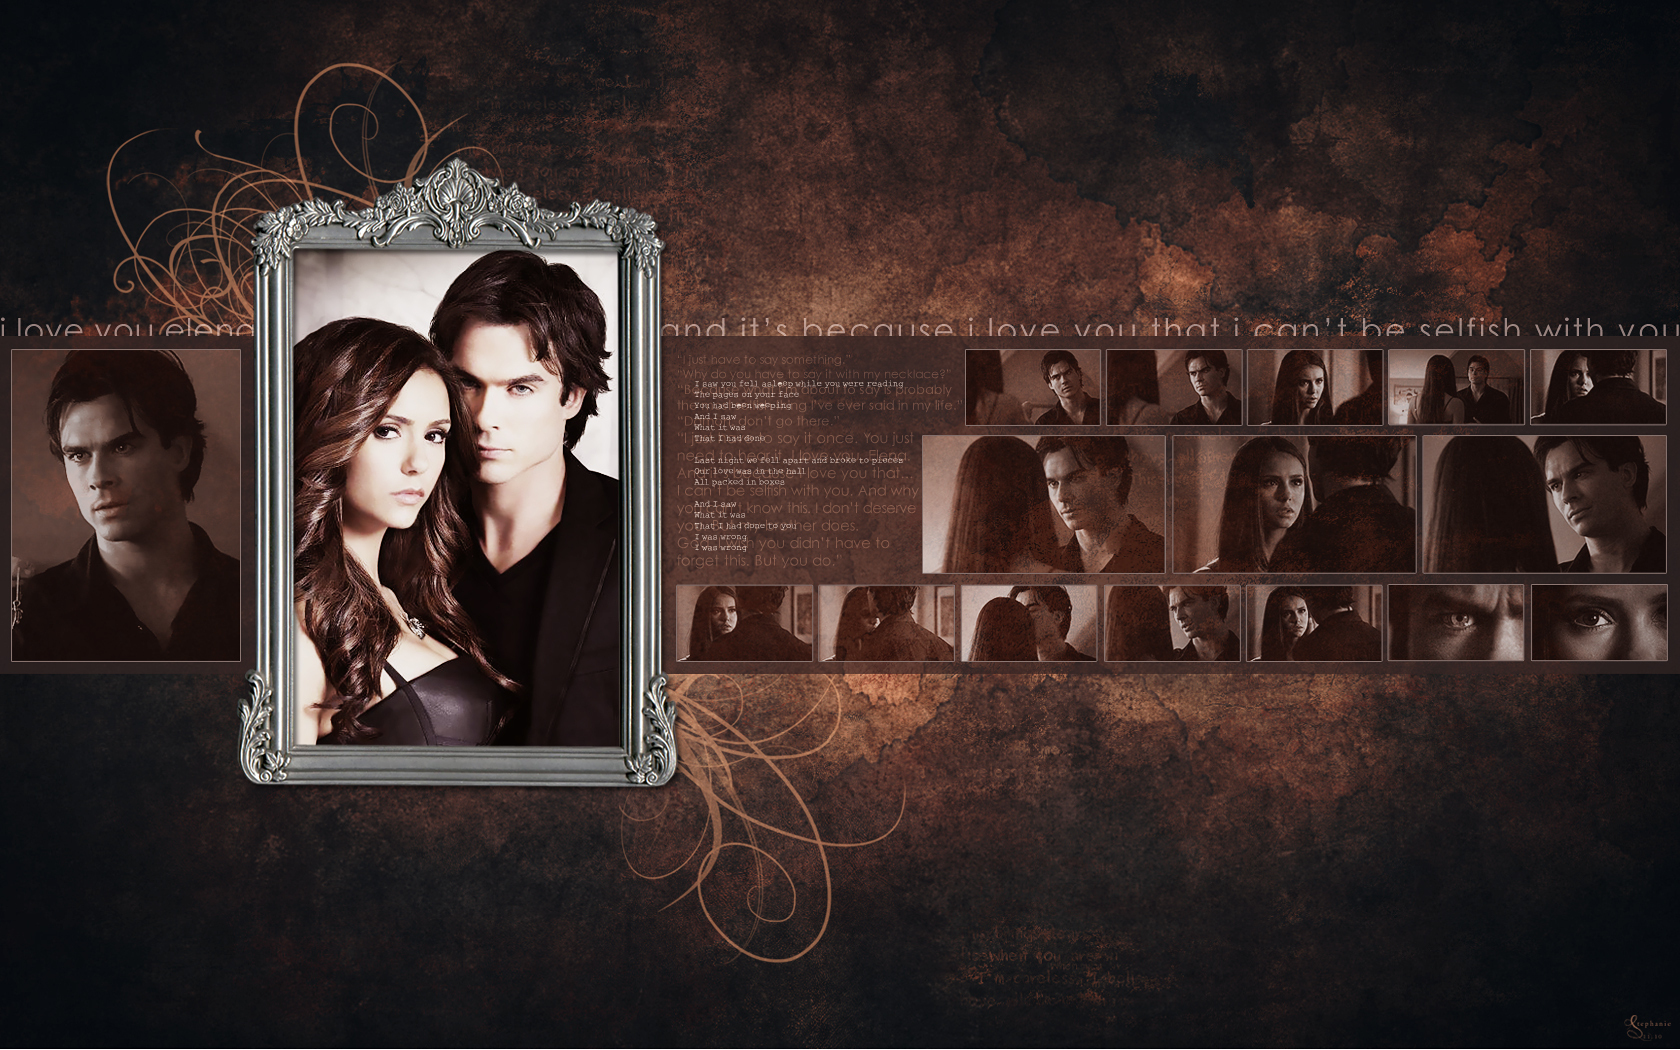 Damon Elena   The Vampire Diaries TV Show Wallpaper 17123319 1680x1050